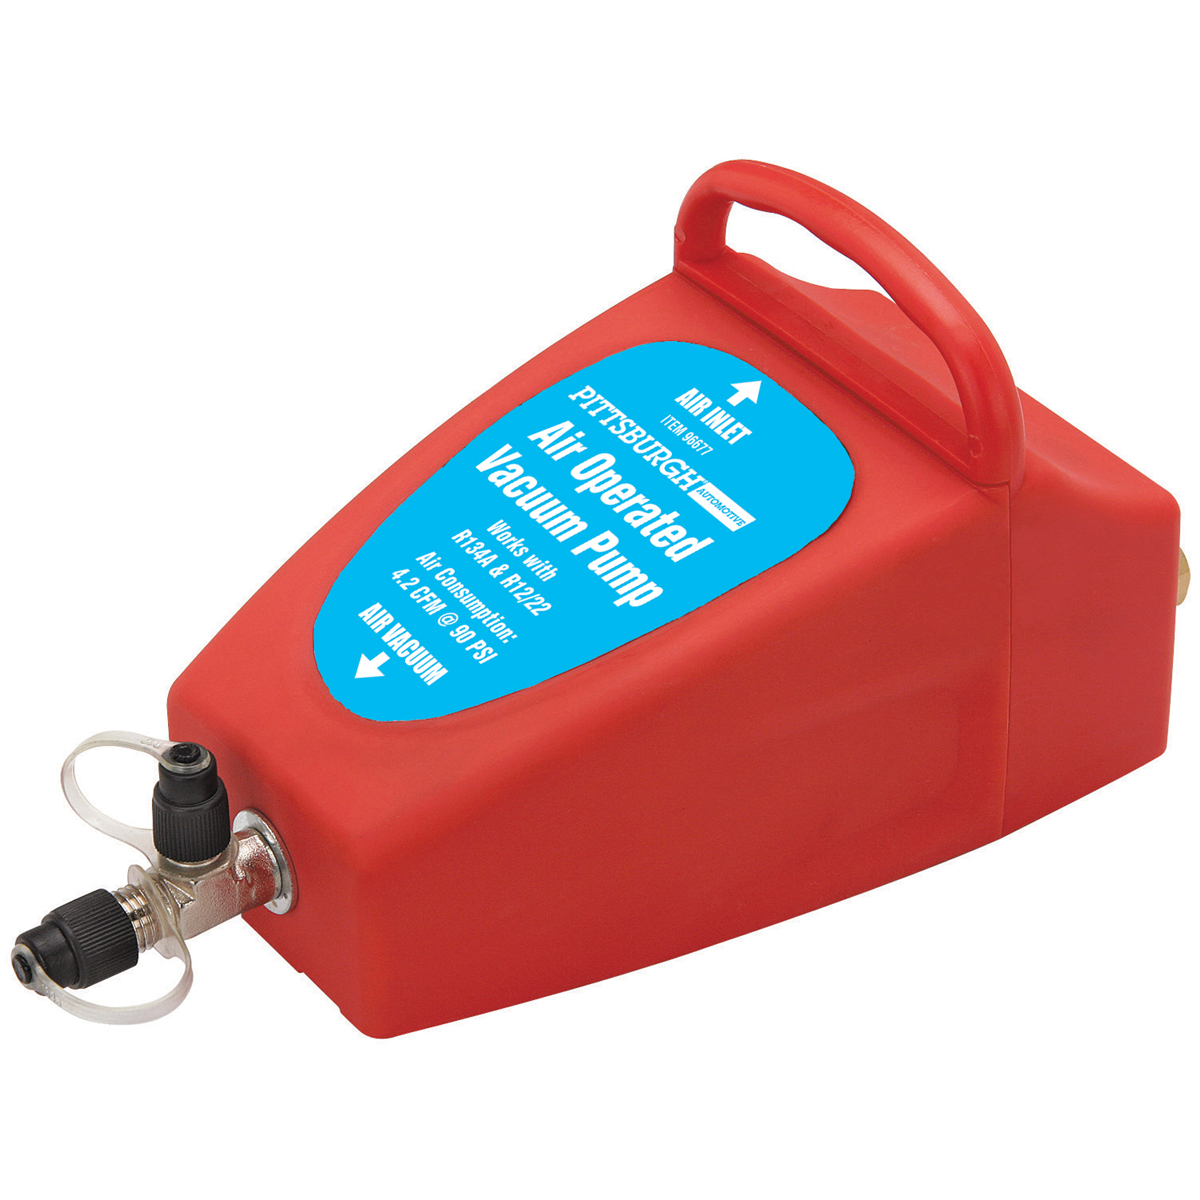 Hvac Vacuum Pump Wiring Diagram Library Gast Pumps Ac W R134a R12 Connectors Taco